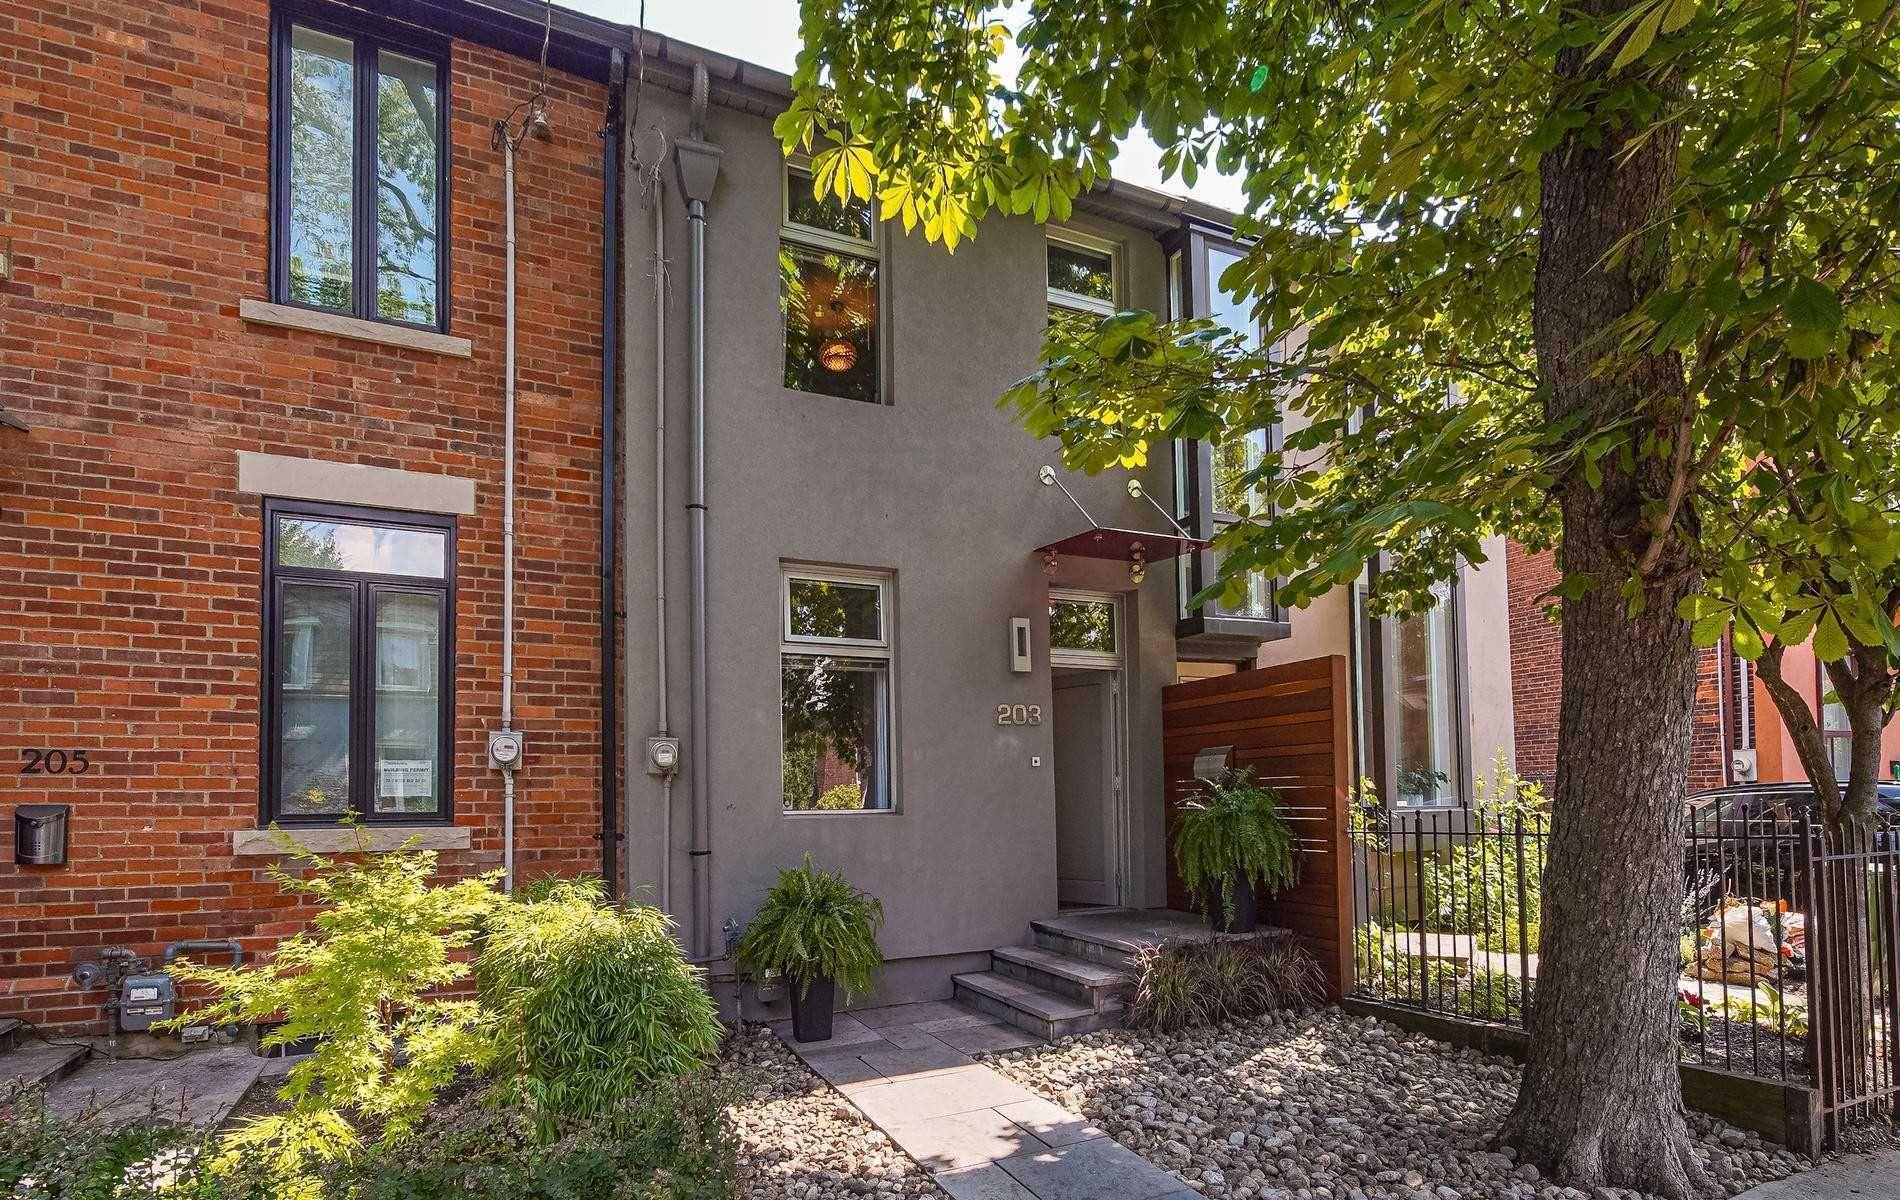 Main Photo: 203 Hamilton Street in Toronto: South Riverdale House (3-Storey) for sale (Toronto E01)  : MLS®# E4922245